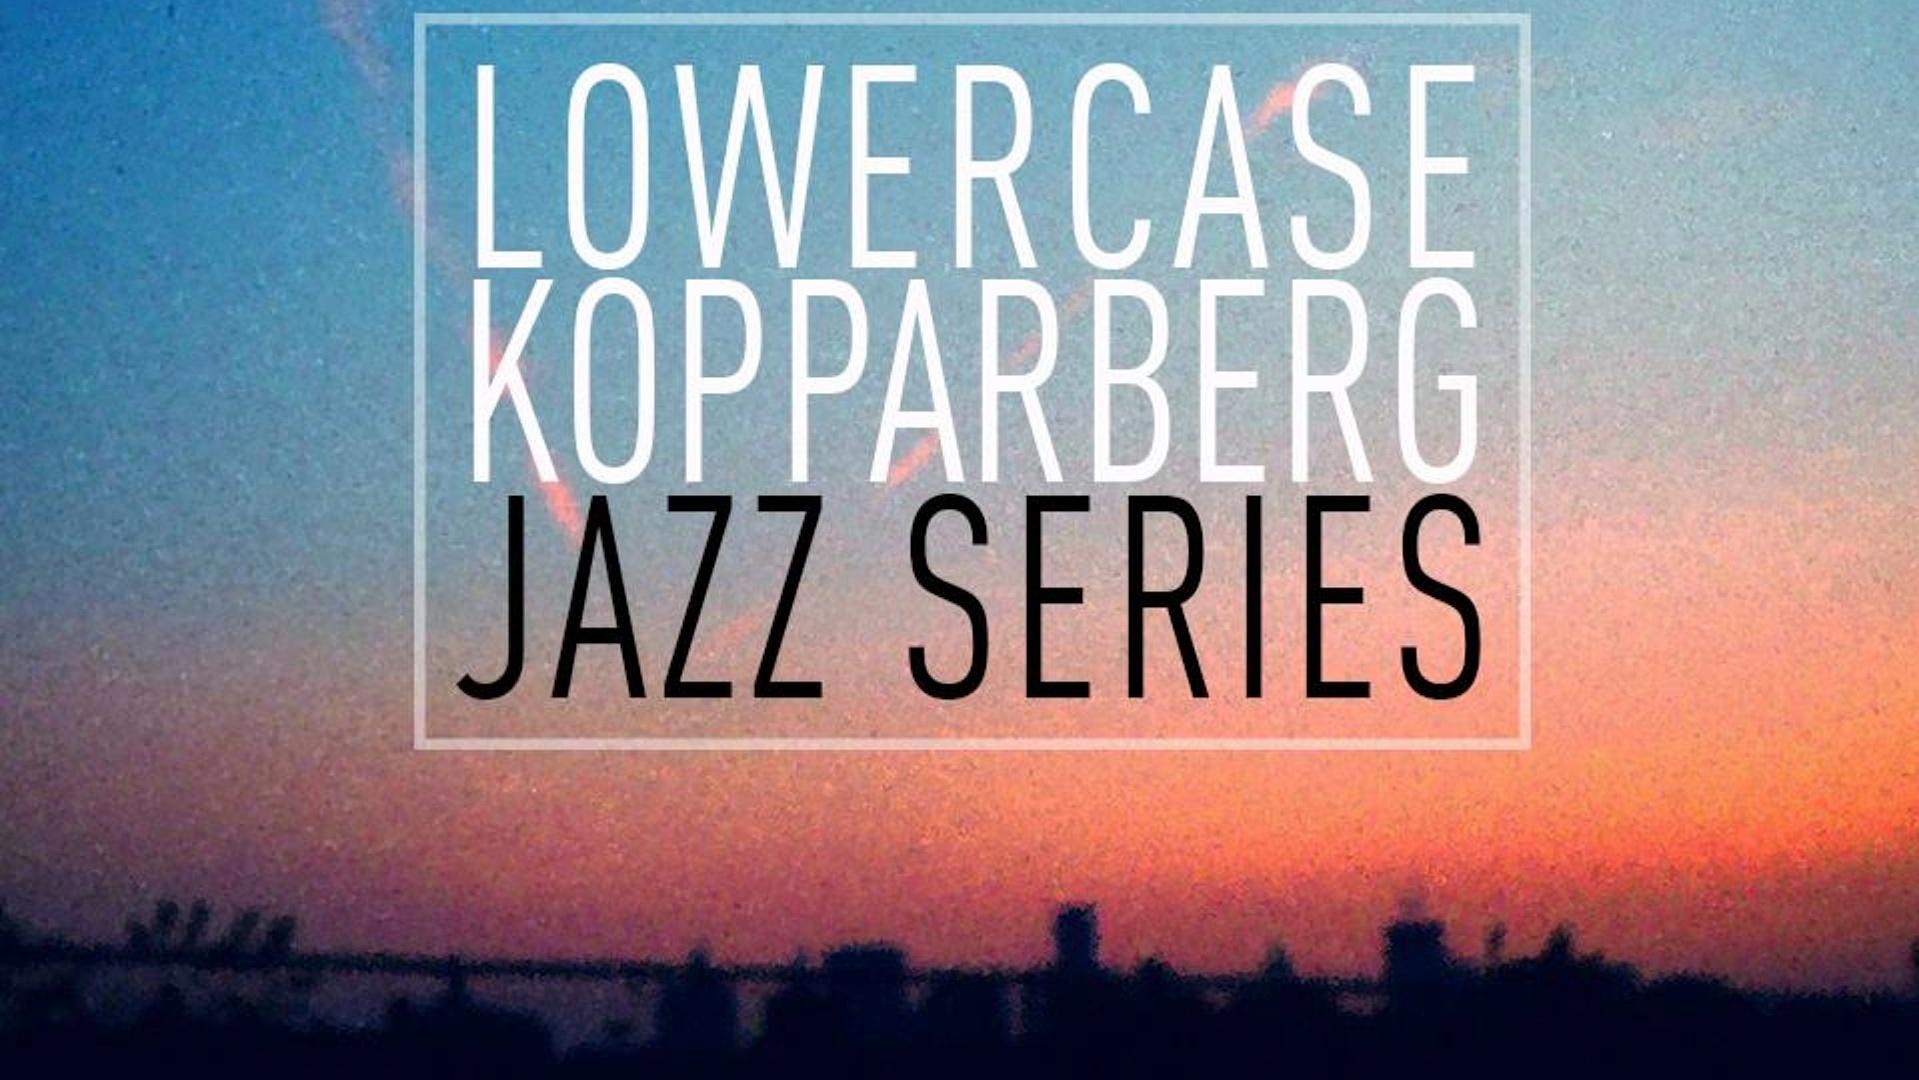 Lowercase Koppaberg Jazz Series #1